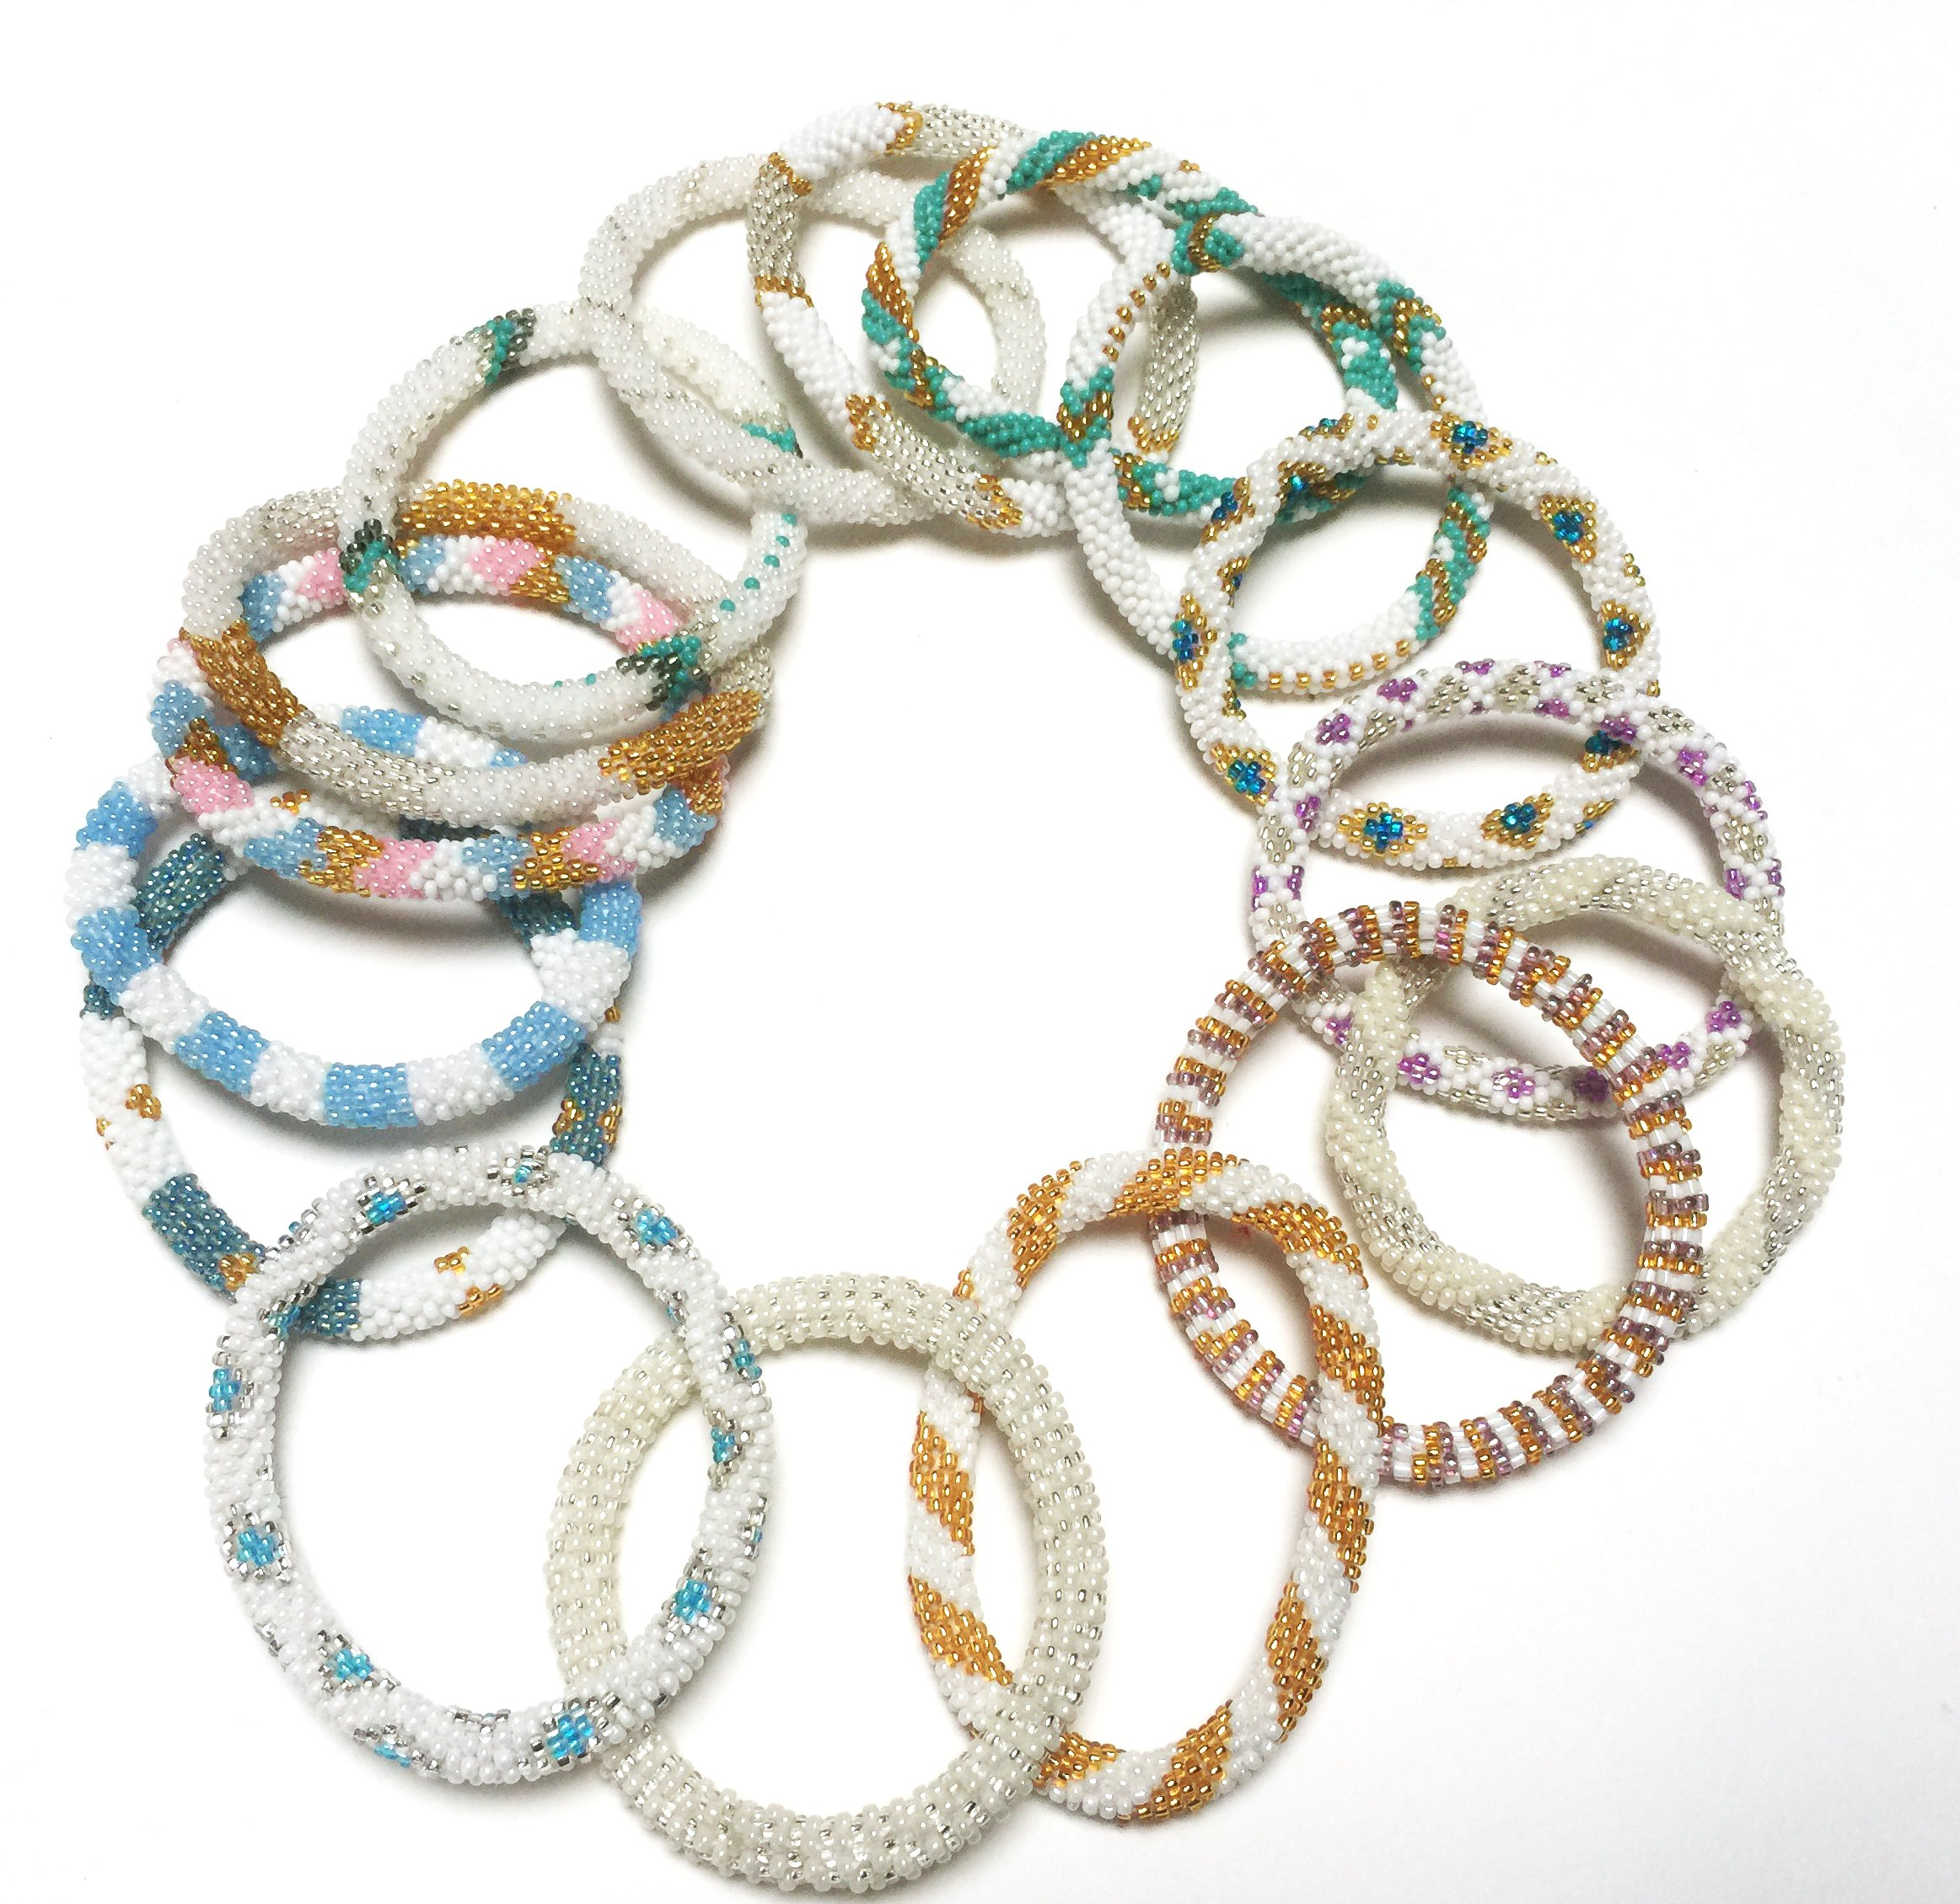 WigsPedia Handmade Crochet Glass Seed Bead Nepal Roll on Boho Bracelet - Wholesale White Scheme (12 Pieces White Bracelets)